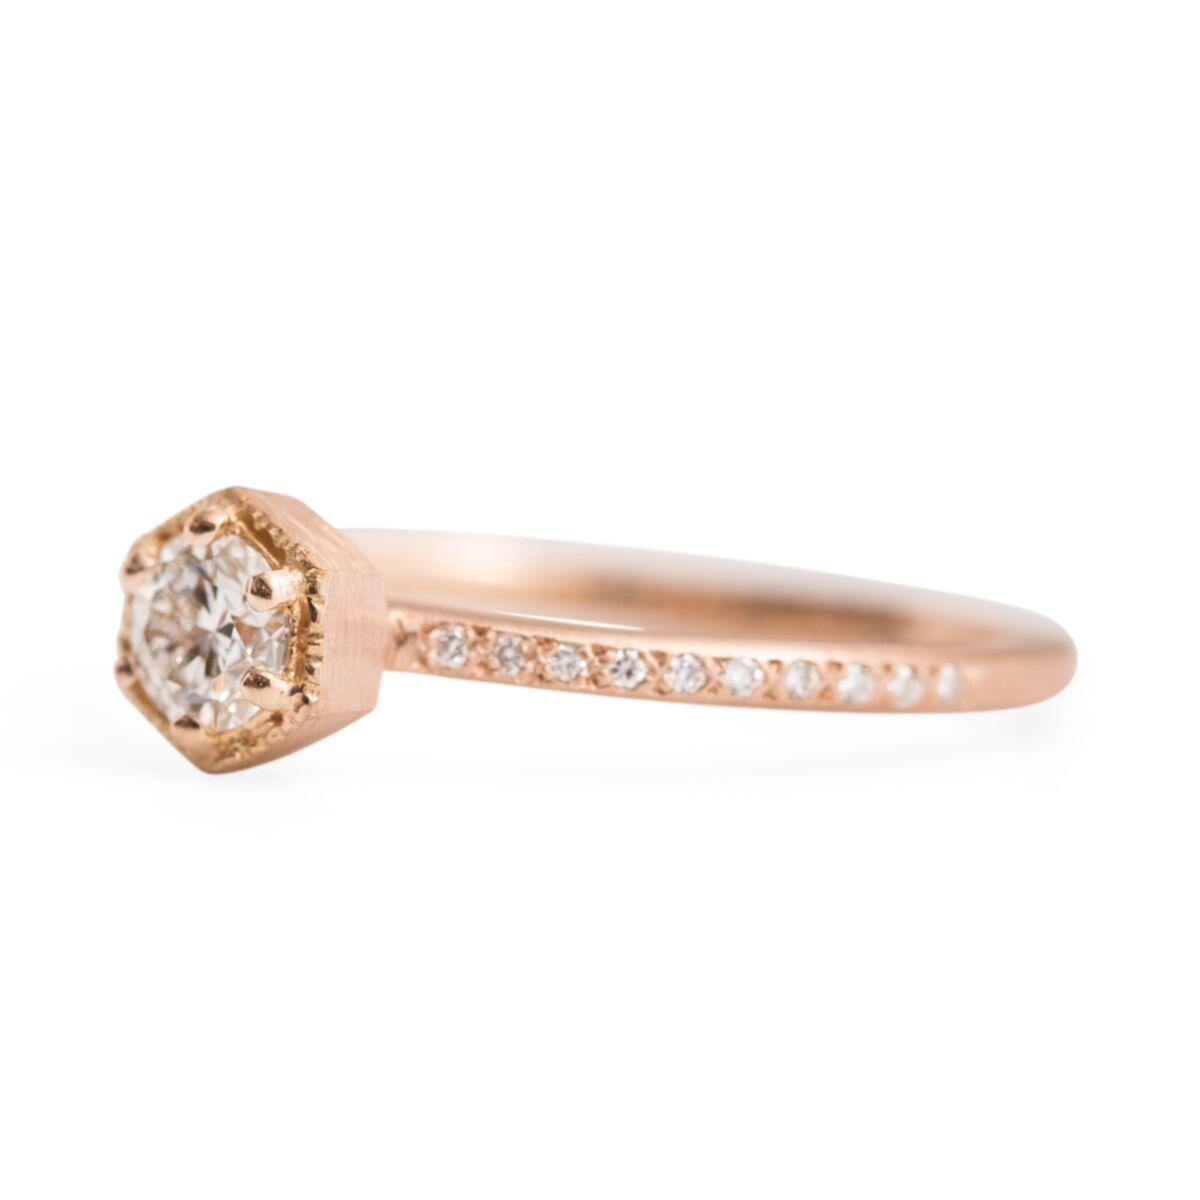 Hexagon Ring Supreme, White Diamond image